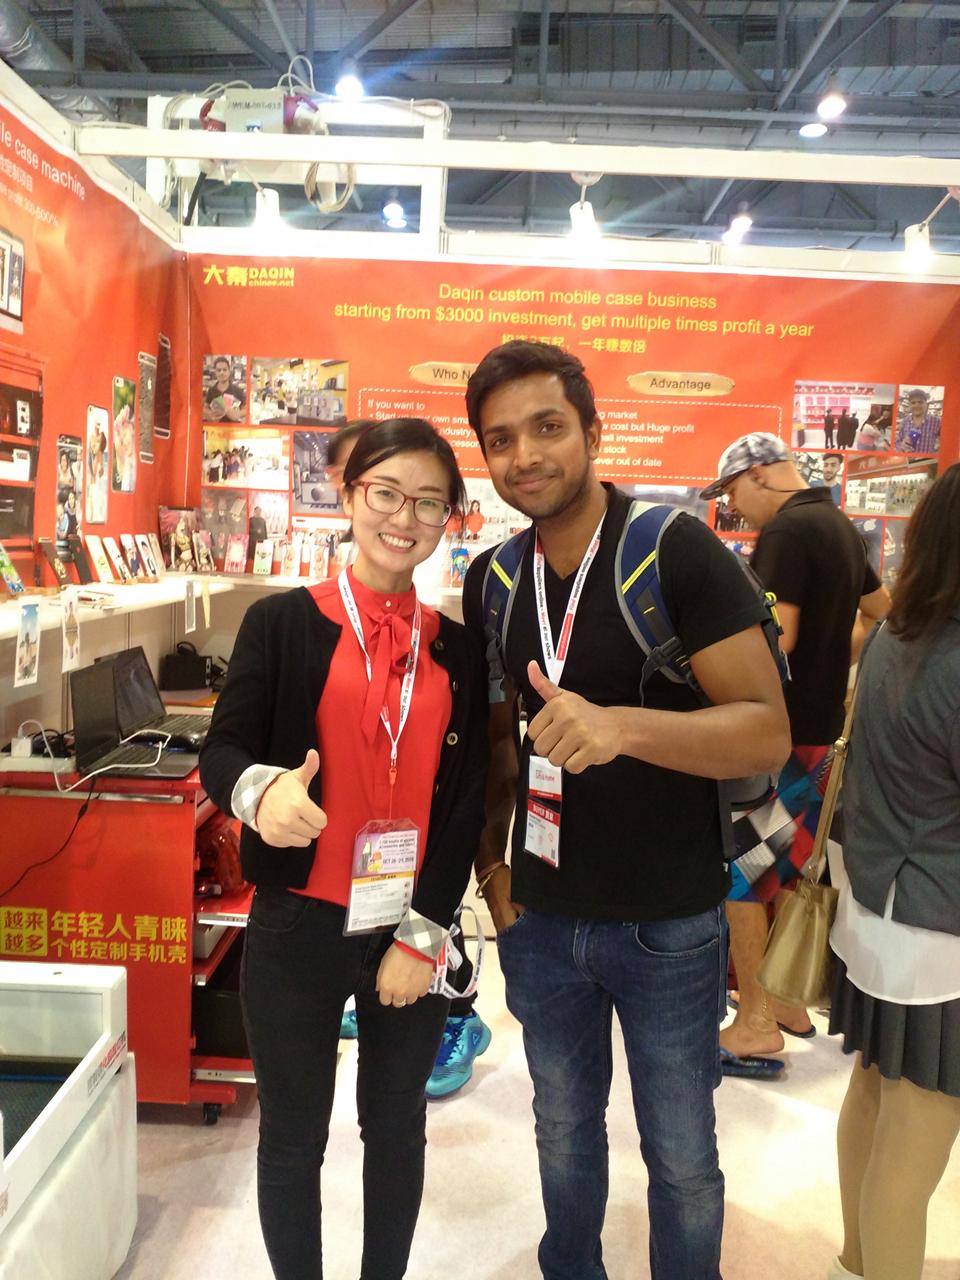 daqin,hong kong fair 2016